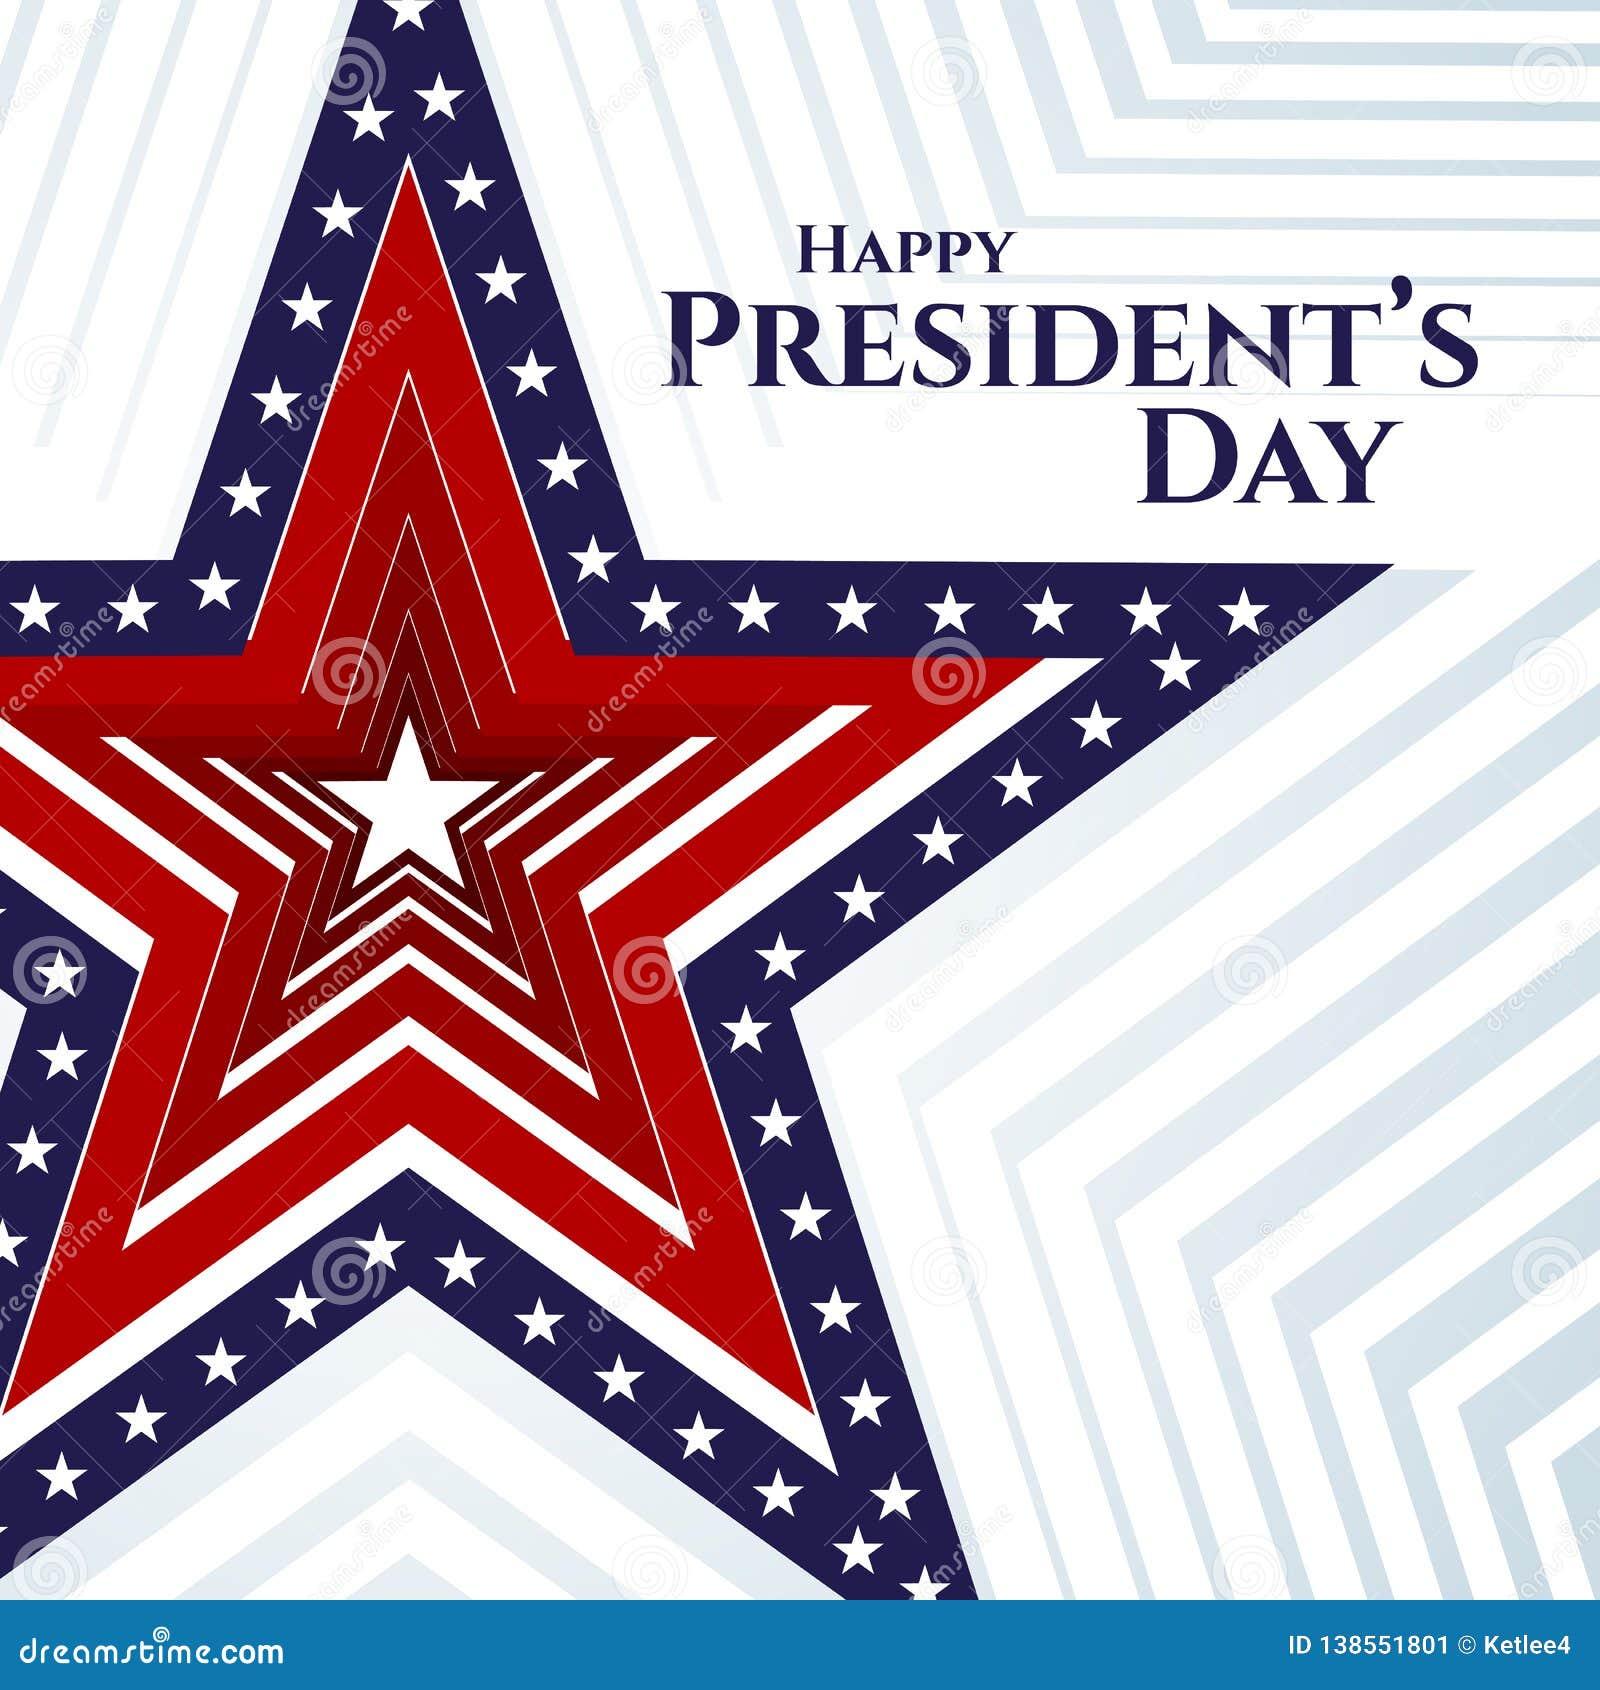 Счастливая звезда американского флага знамени текста дня президента на нашивках звезды картины флага США темы светлой предпосылки